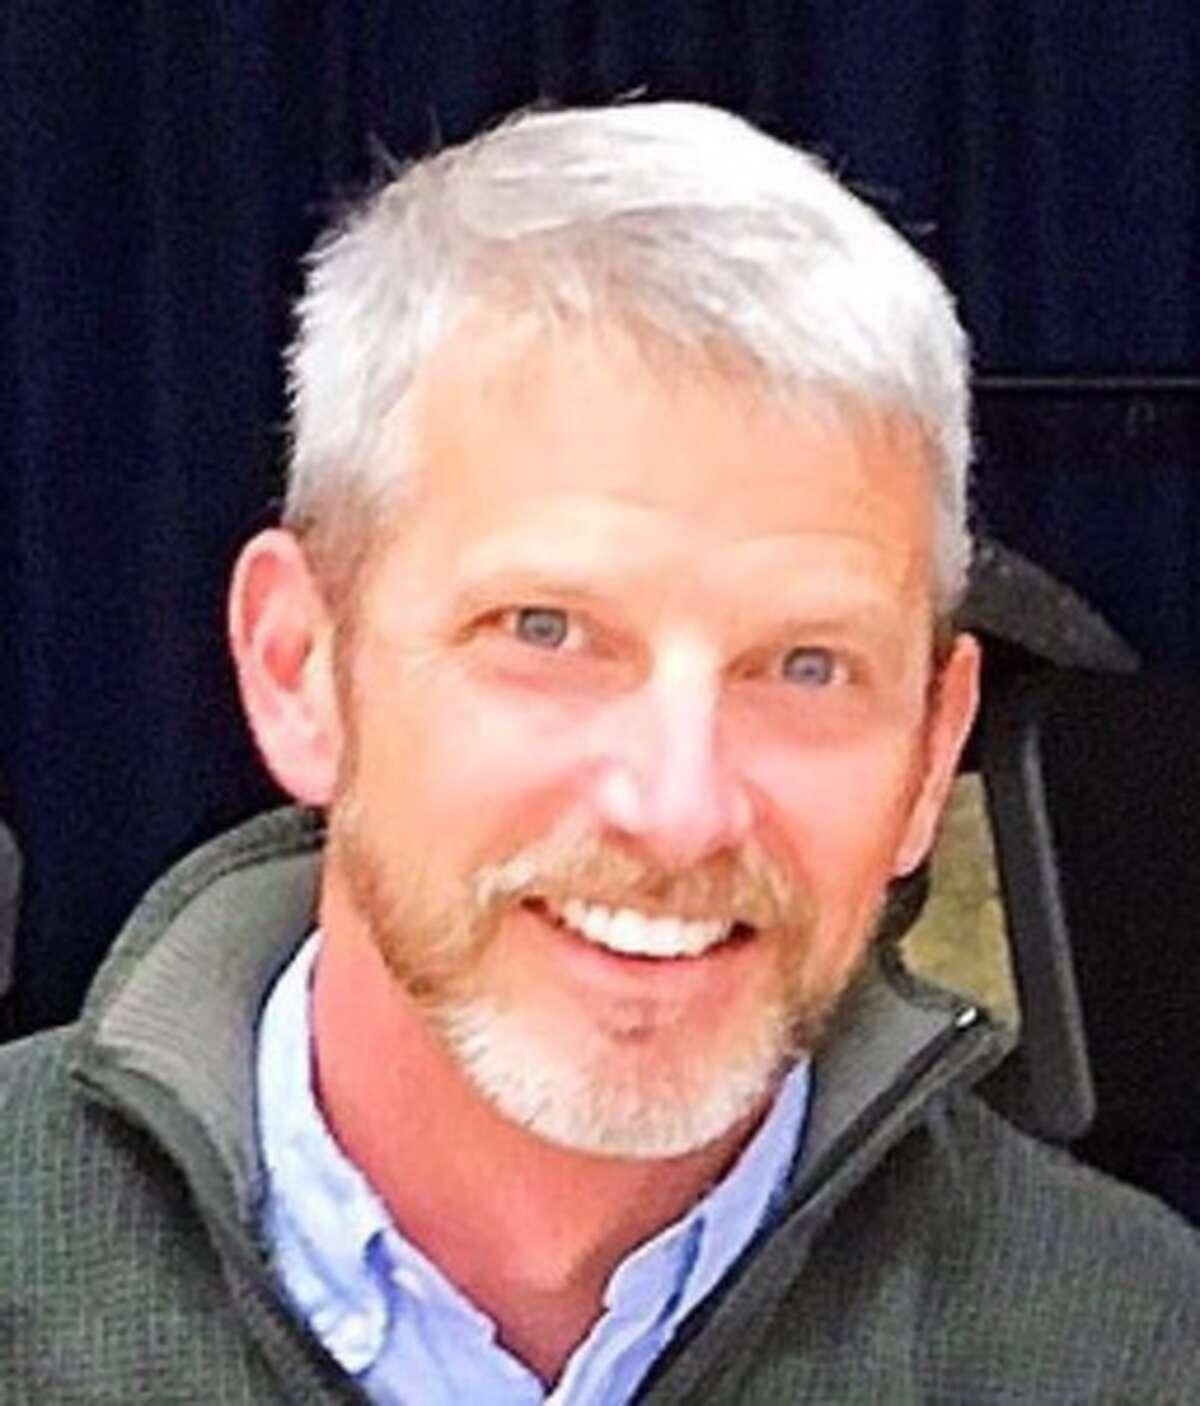 Michael Redgate